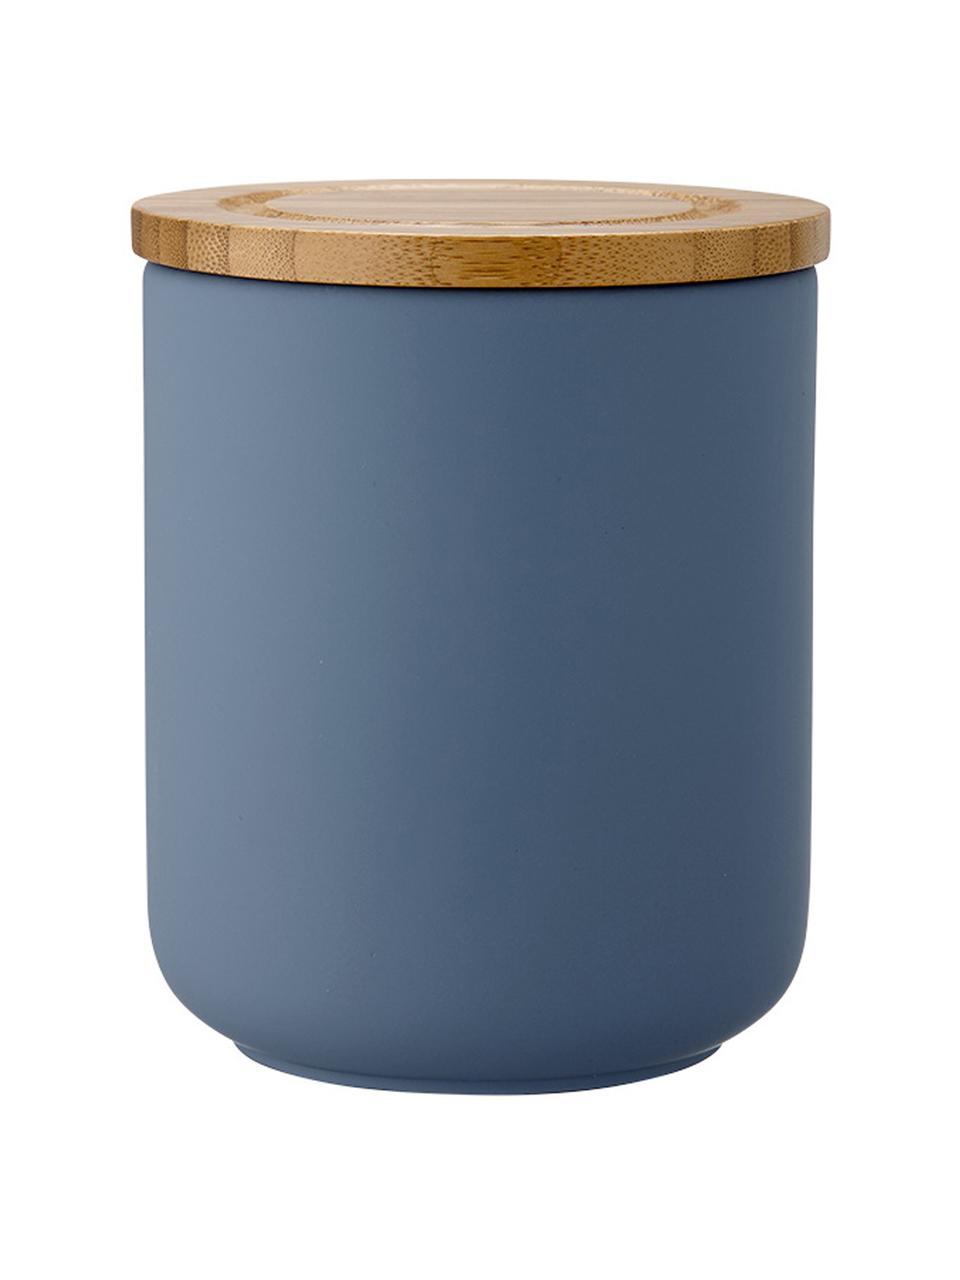 Barattolo con coperchio Stak, Coperchio: legno di bambù, Blu opaco, bambù, Ø 10 x Alt. 13 cm